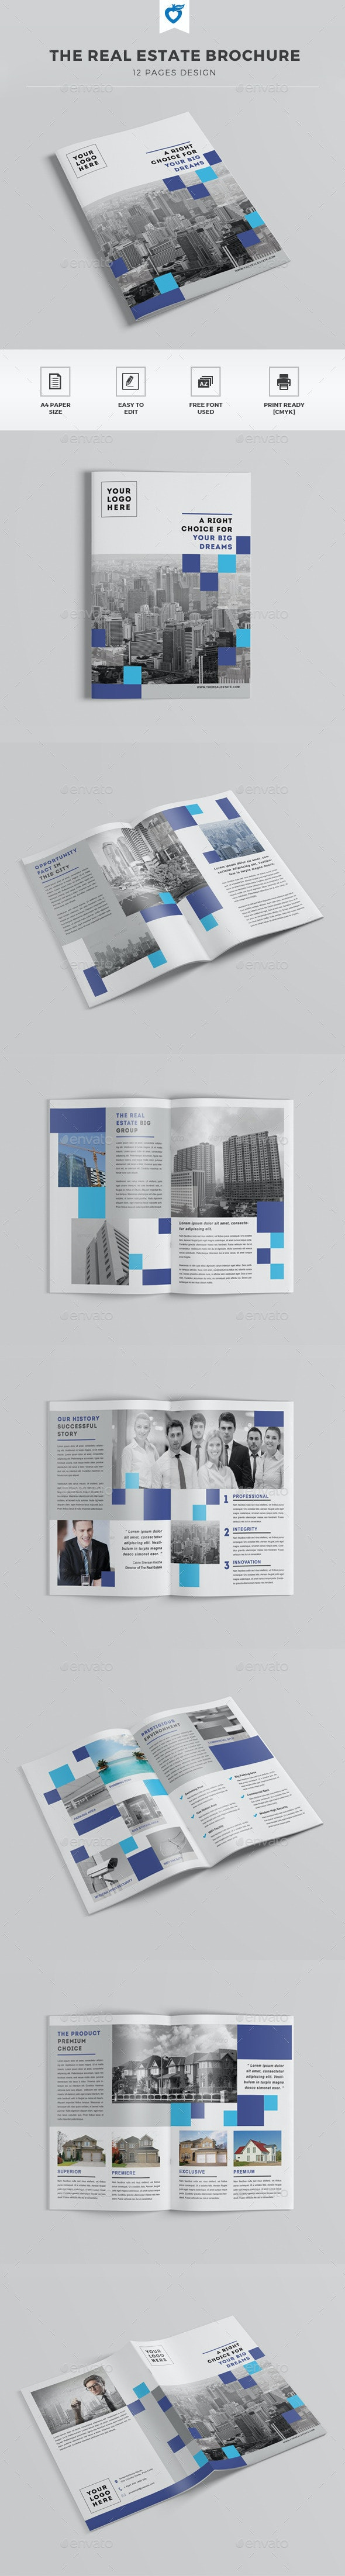 The Real Estate Brochure - Corporate Brochures